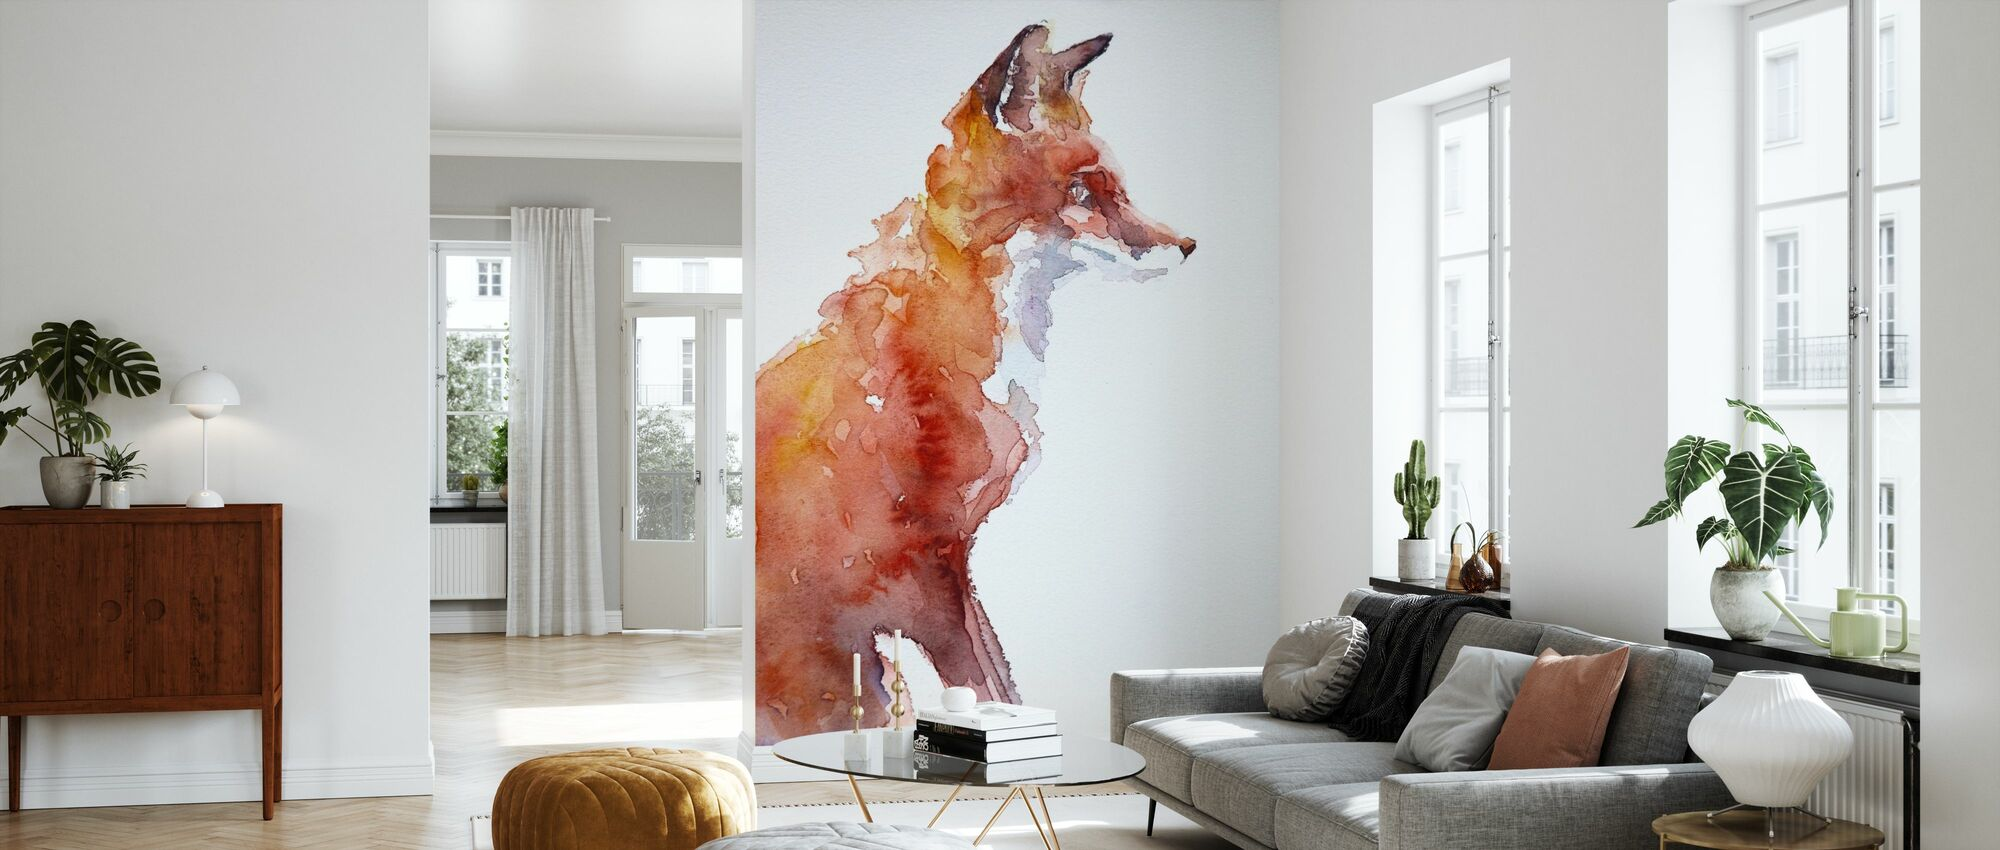 Sly As A Fox Wall Murals Online Photowall